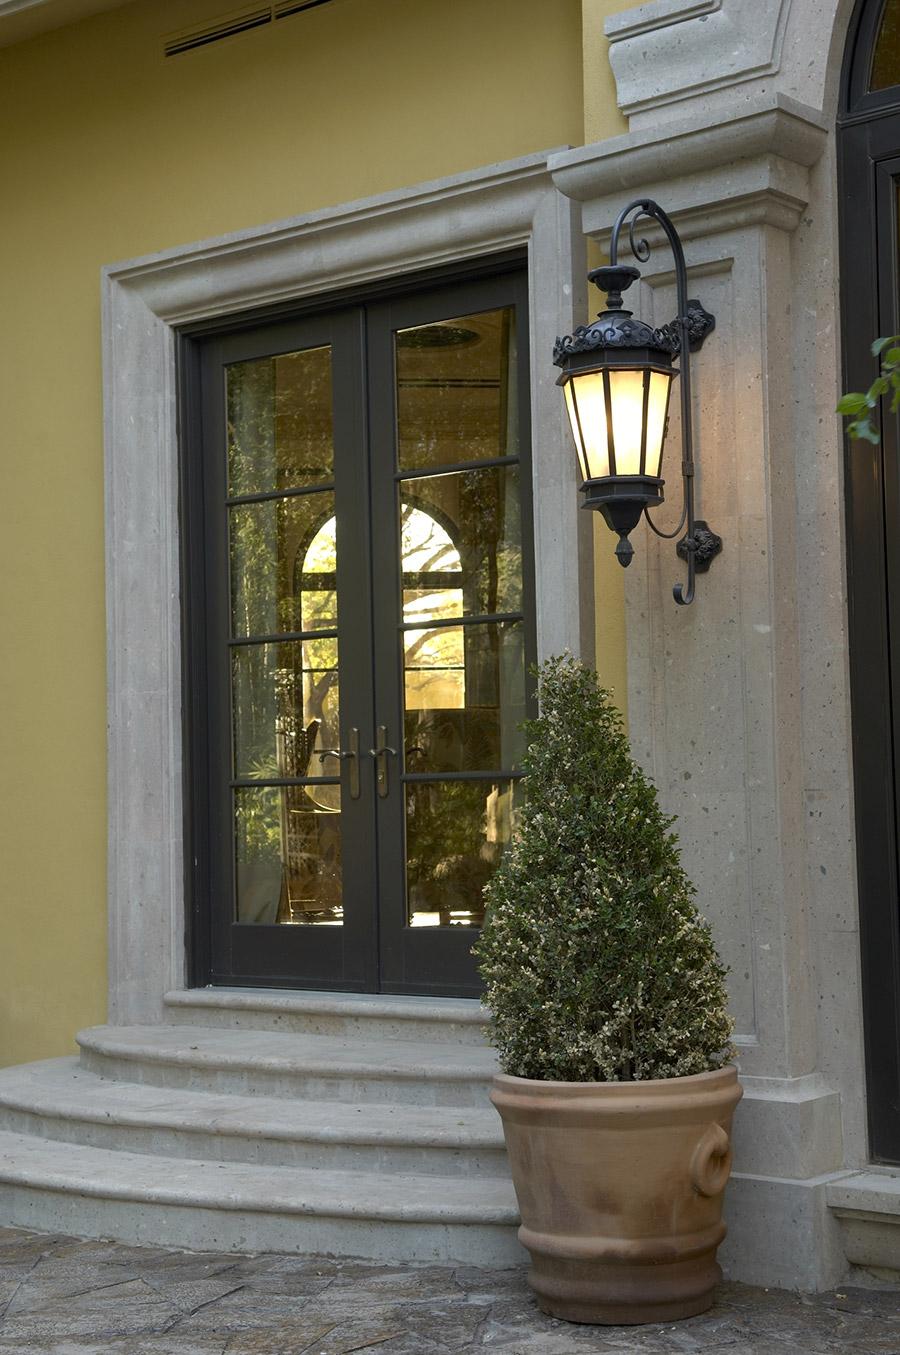 Chianti-OLS-CLA-E-003-classic--outdoor-Steel-Lighting-Post-Santa-Barbara-Residence-(26)